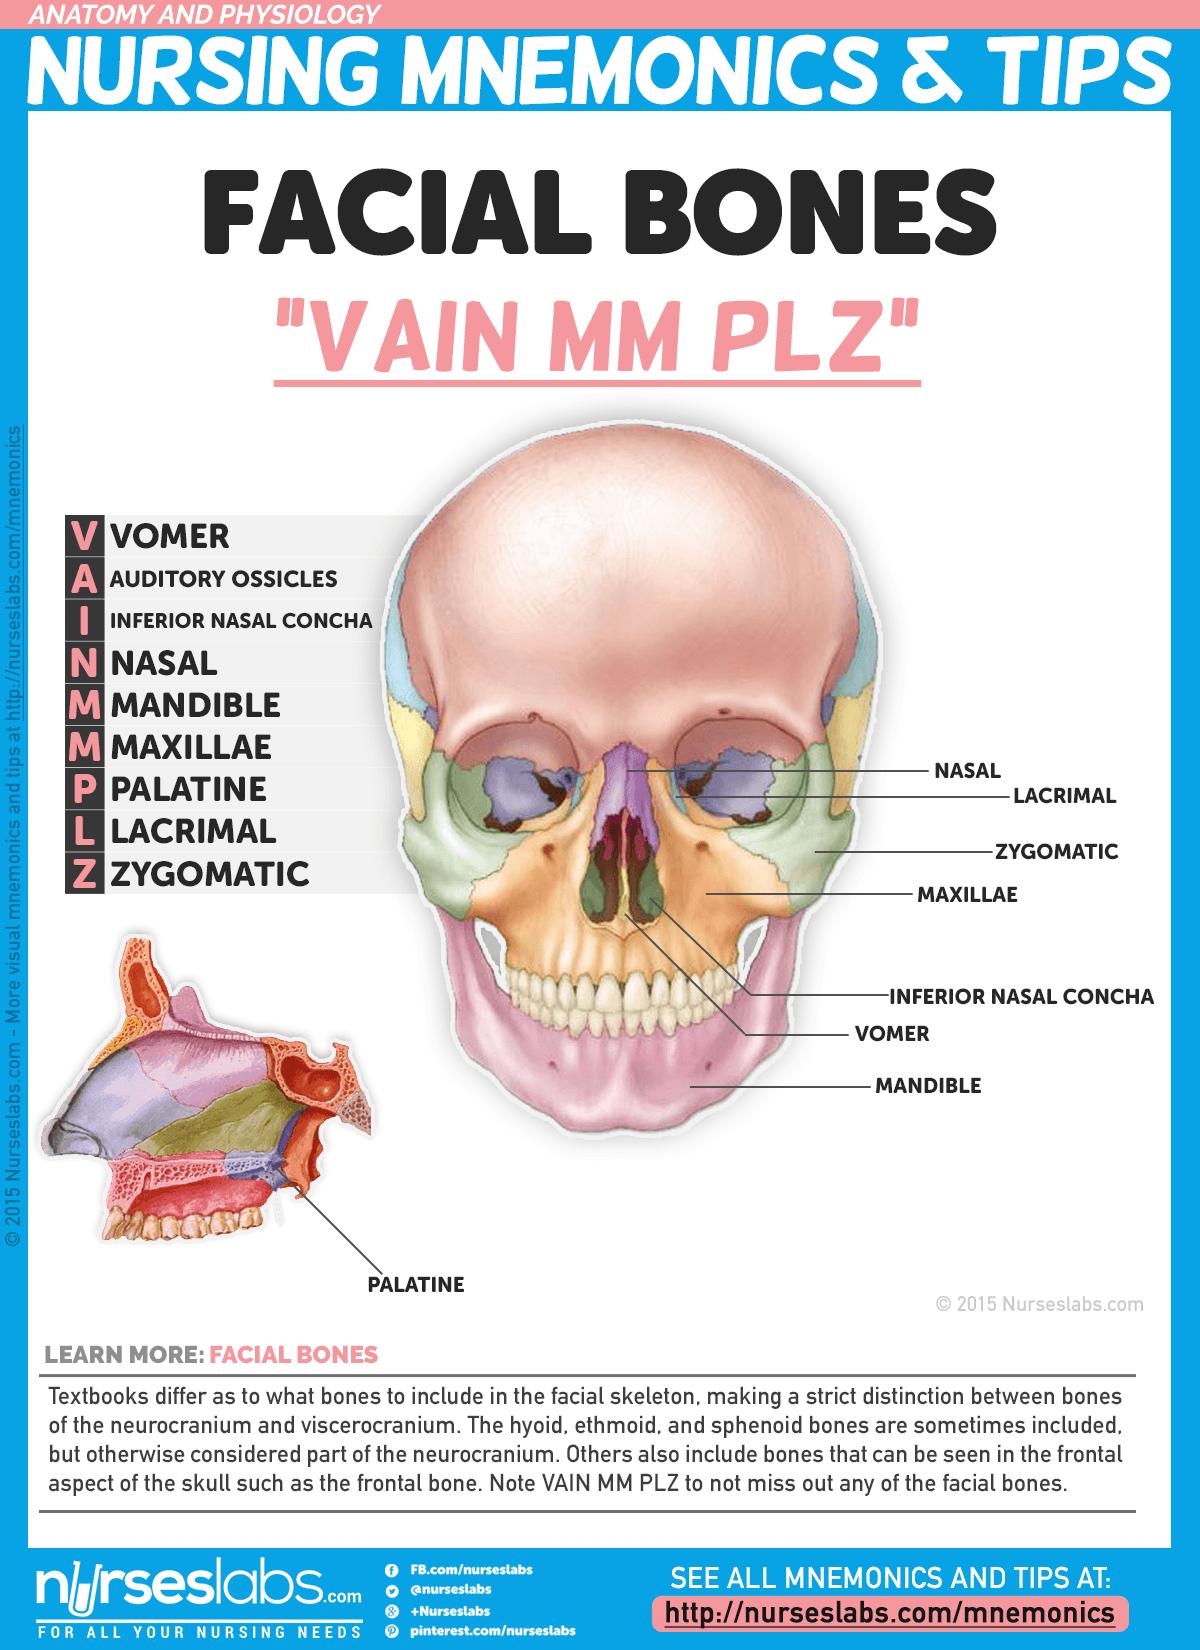 Anatomy And Physiology Nursing Mnemonics Tips Facial Bones